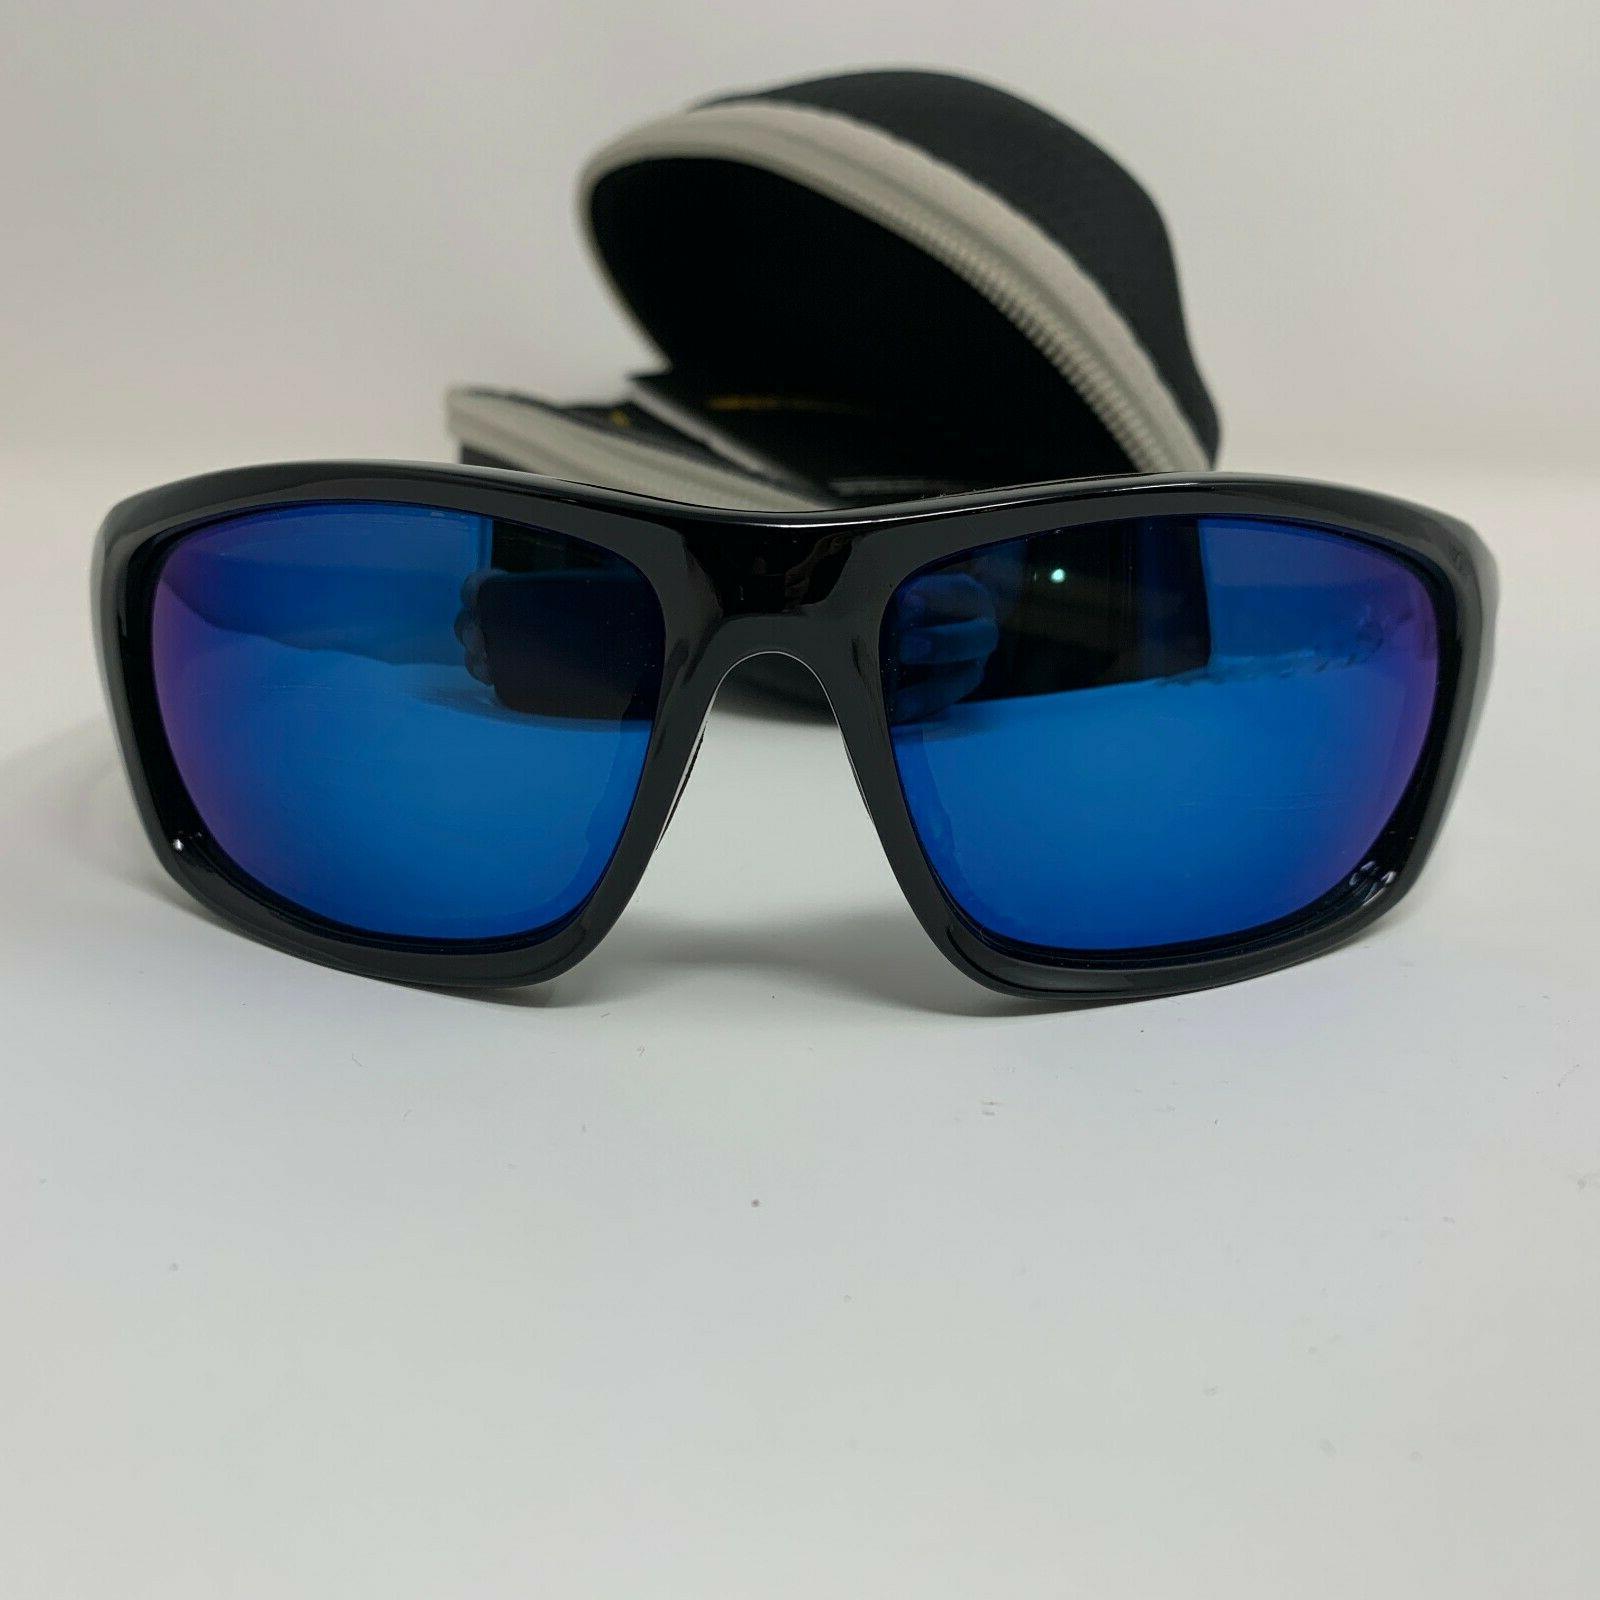 polarized sunglasses black tr011 60 17 131